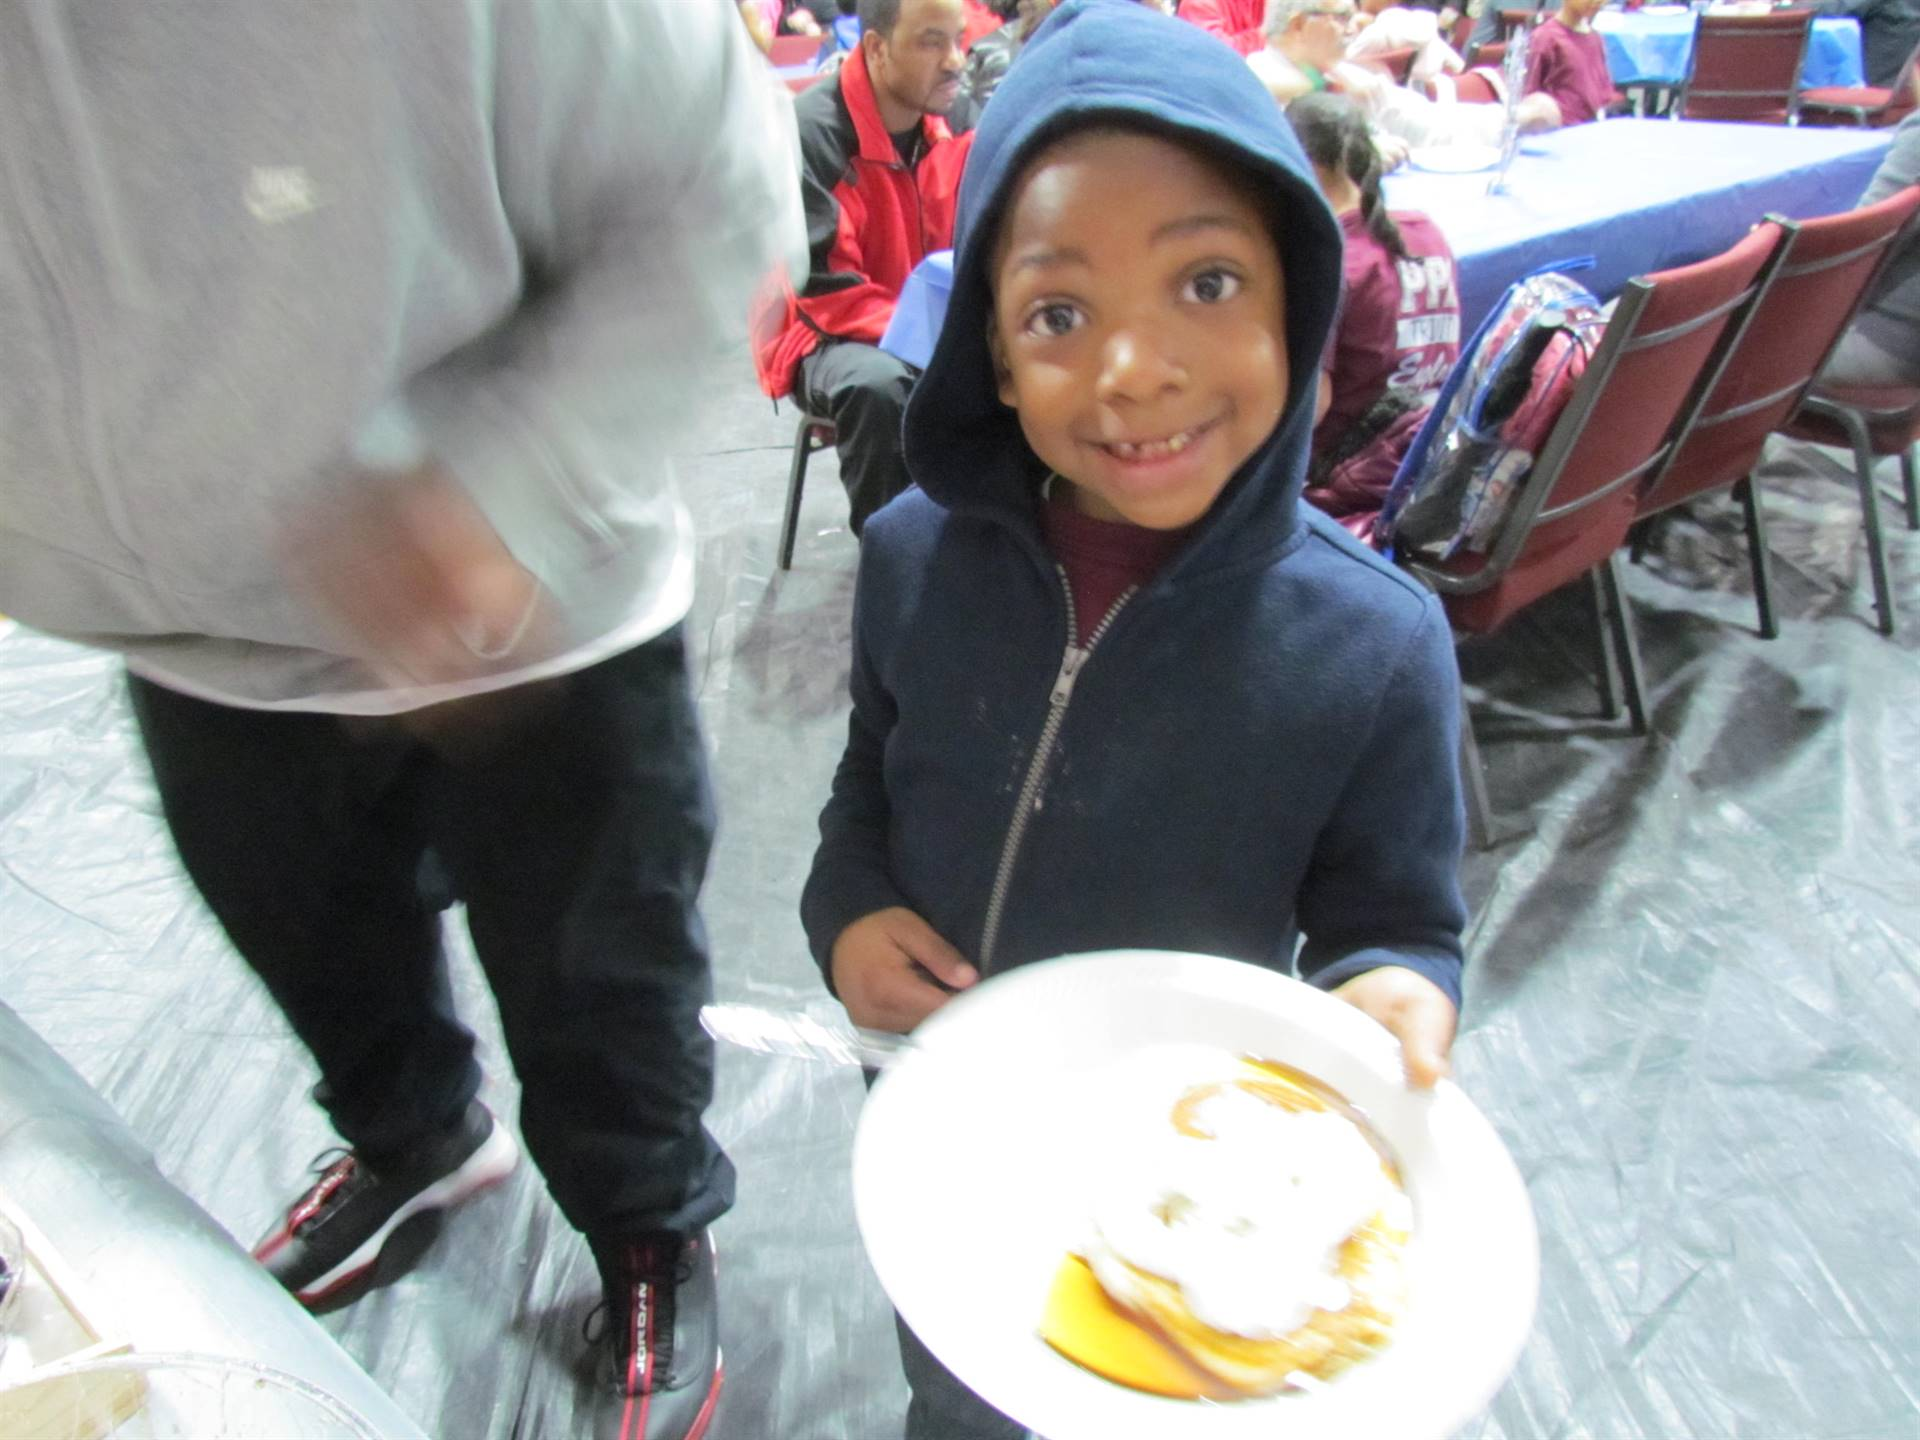 boy holding pancake on plate